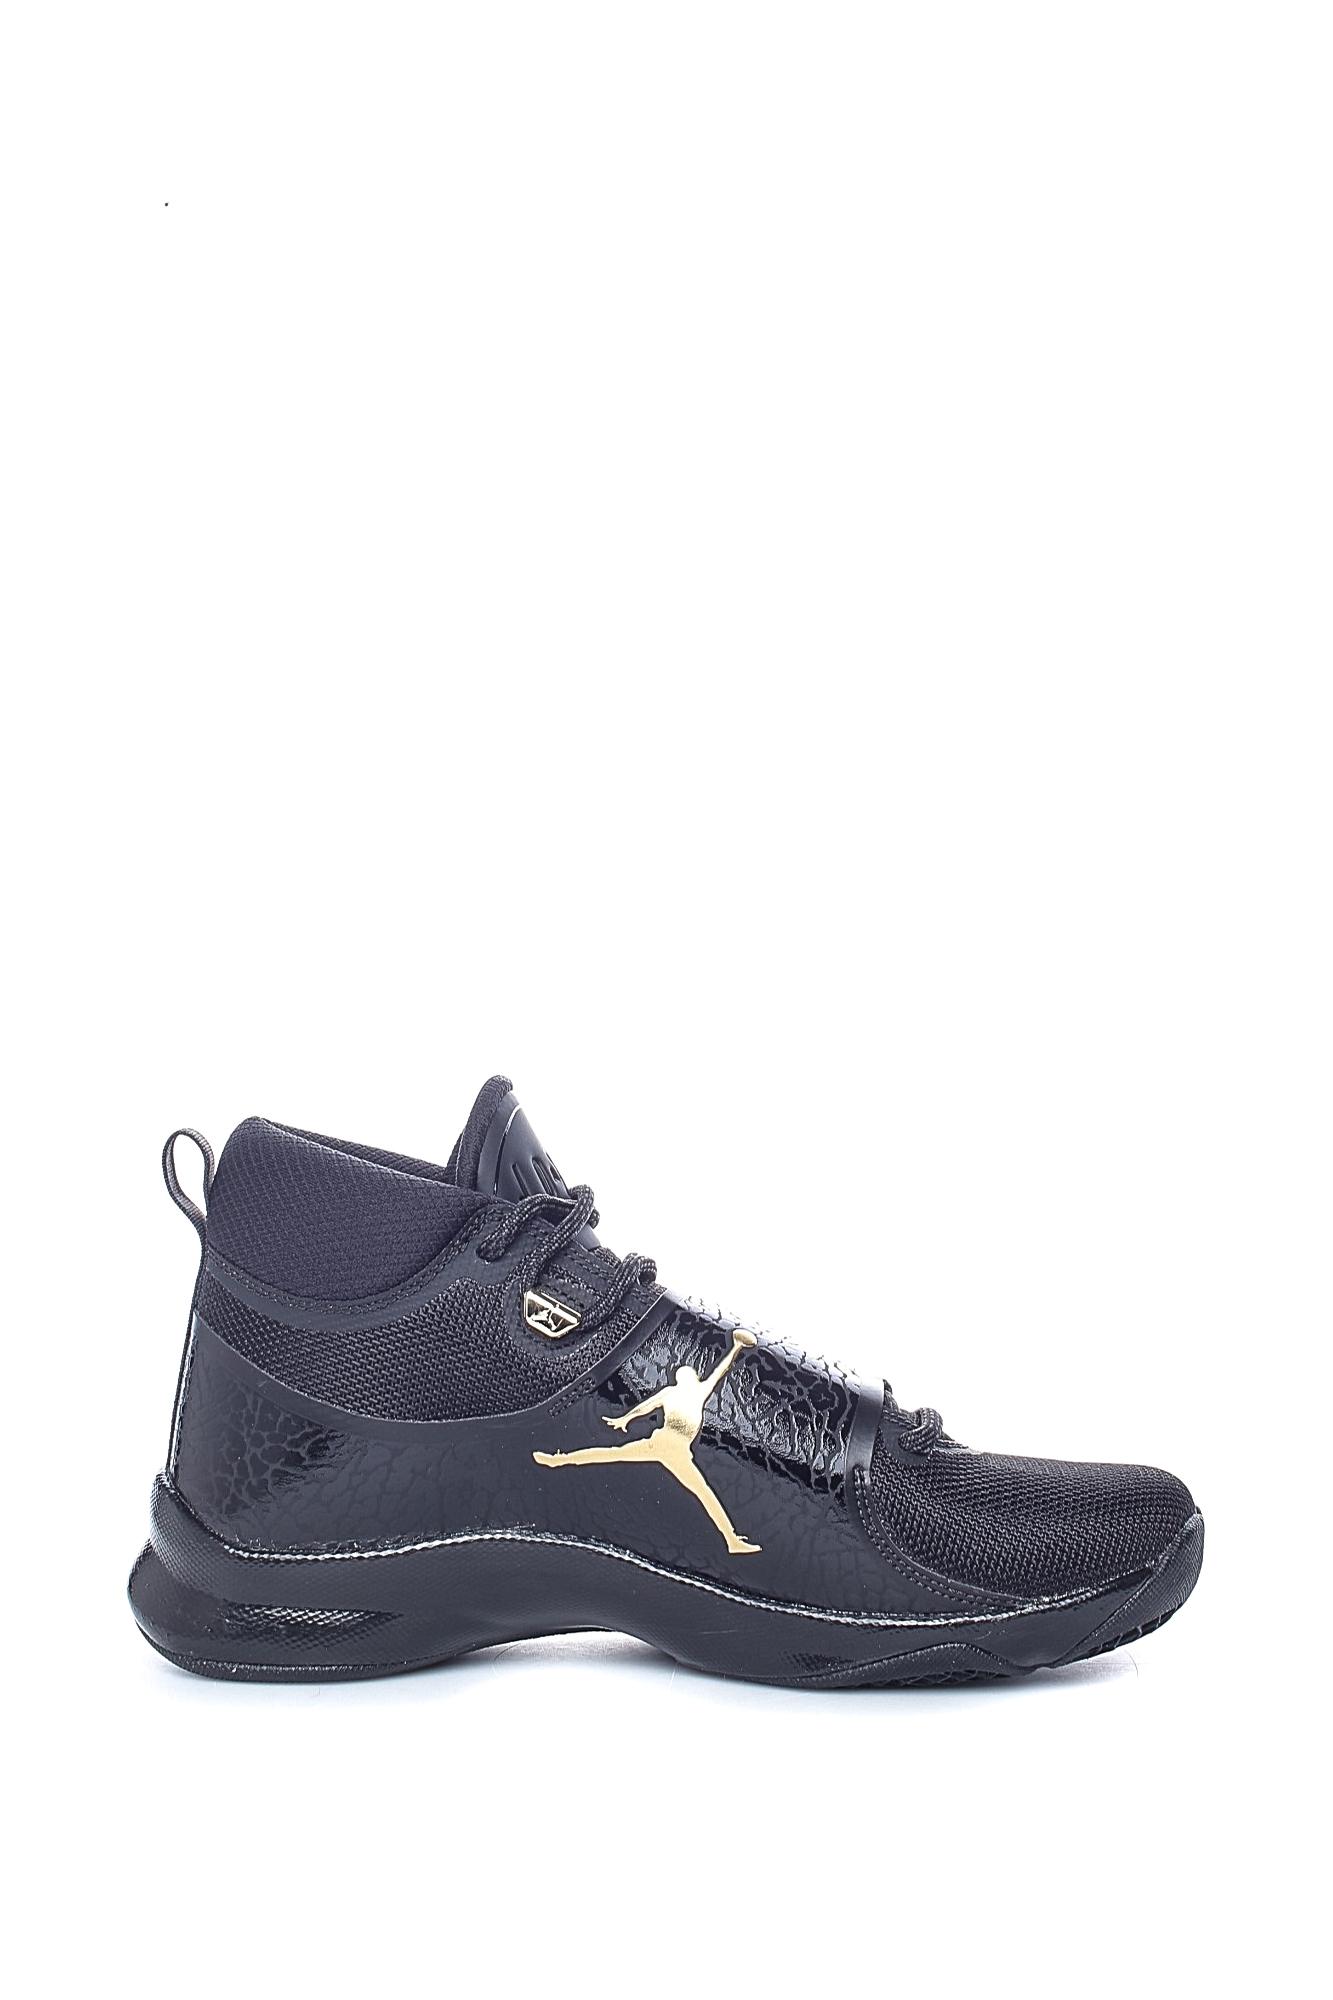 NIKE – Ανδρικά παπούτσια μπάσκετ Nike JORDAN SUPER.FLY 5 PO μαύρα